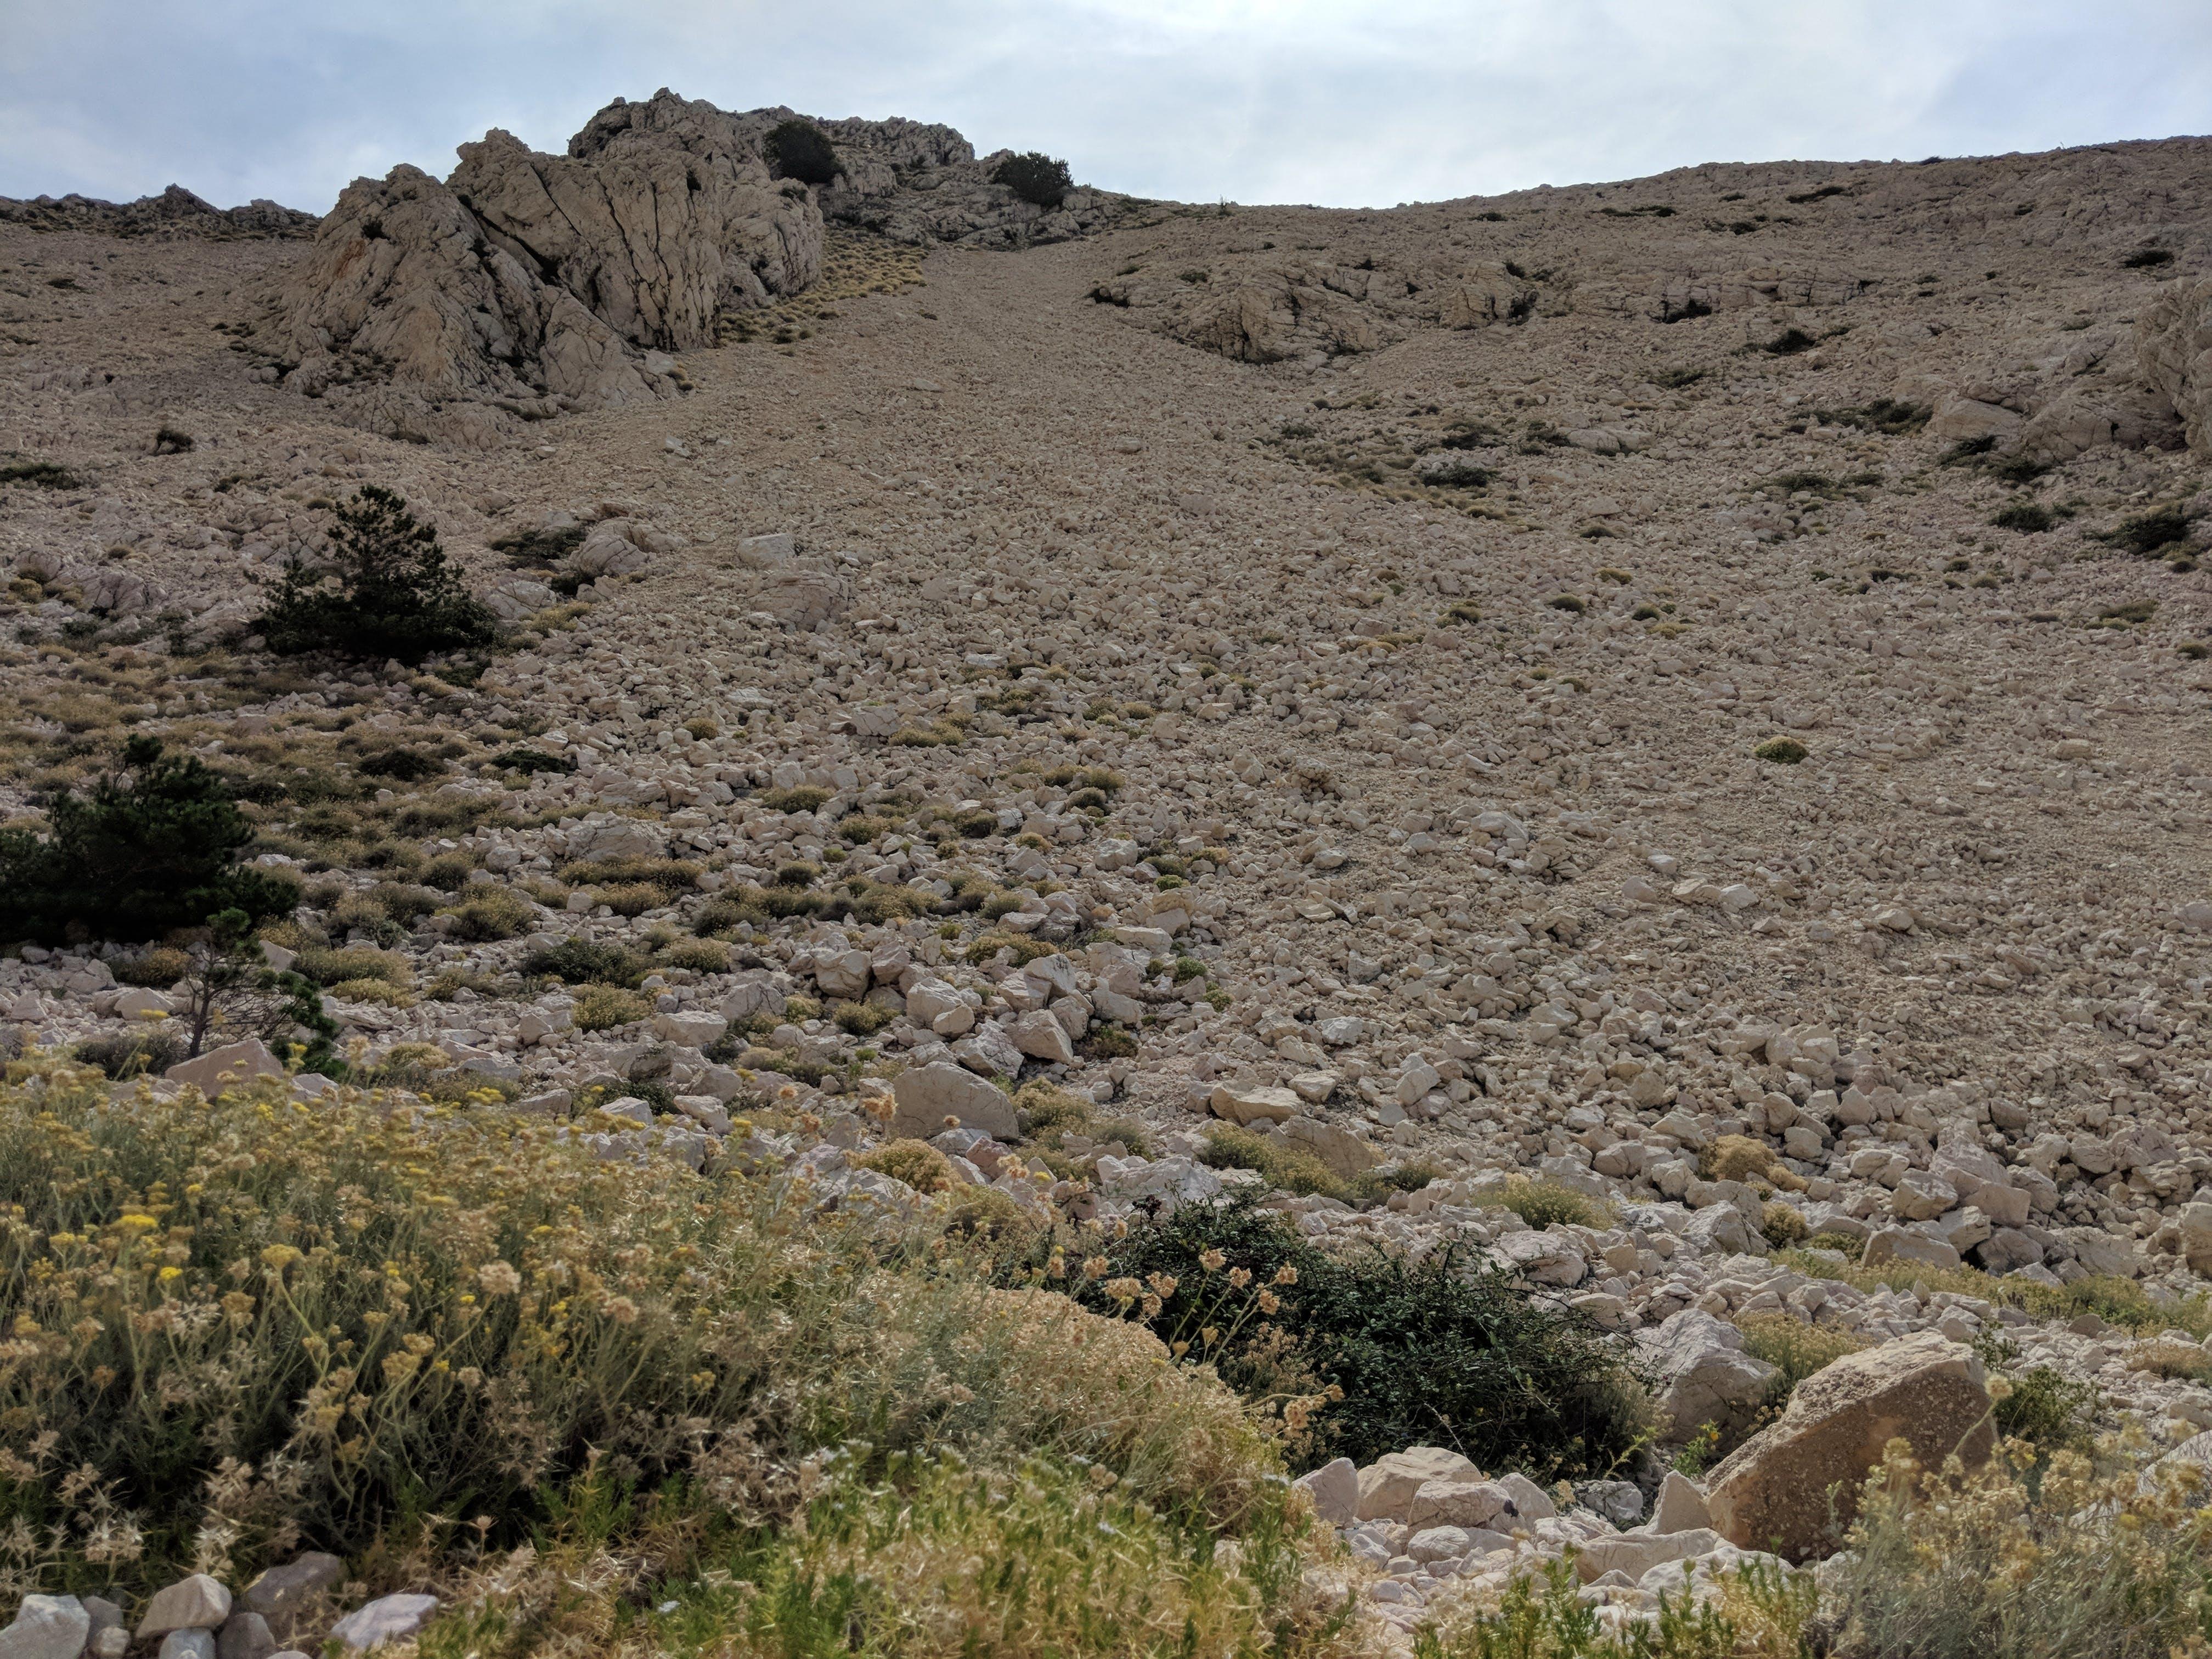 Kostenloses Stock Foto zu berge, bergwandern, felsen, felsig